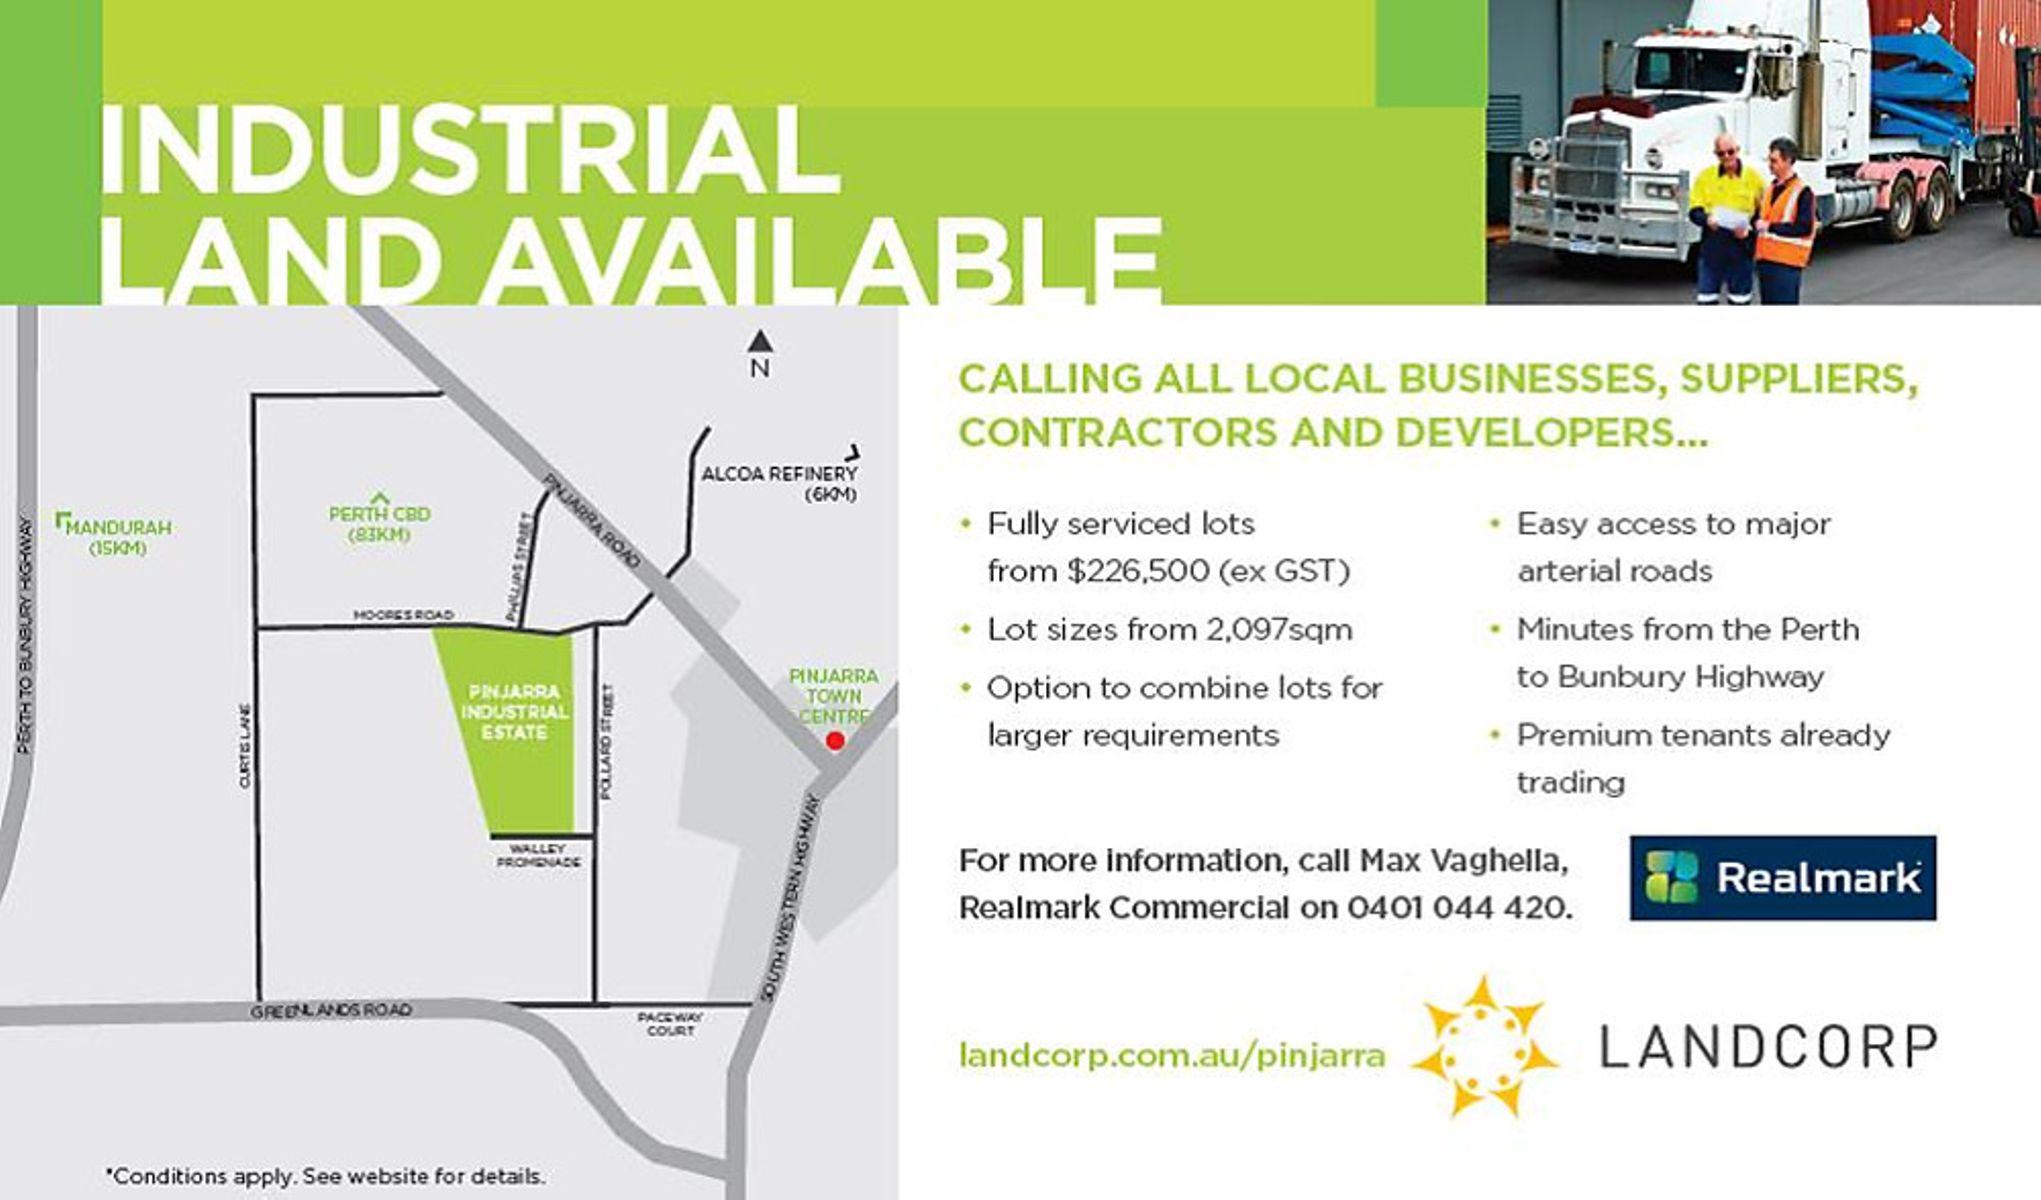 Realmark Commercial :: Pinjarra Industrial Estate, Pinjarra, WA 6208